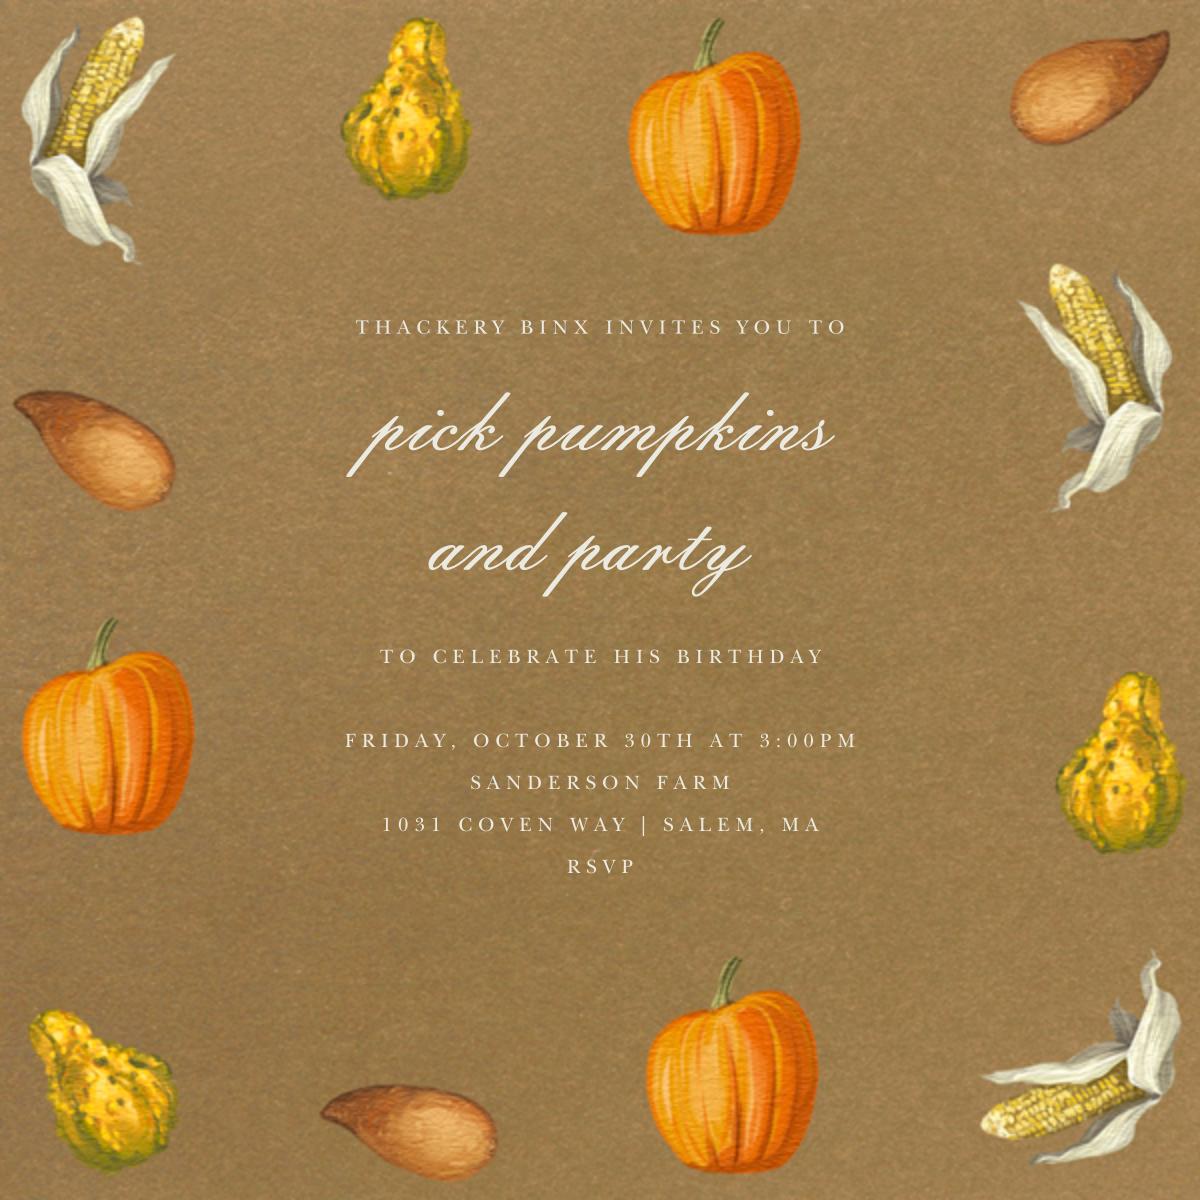 Thanksgiving Food - Paperless Post - Adult birthday